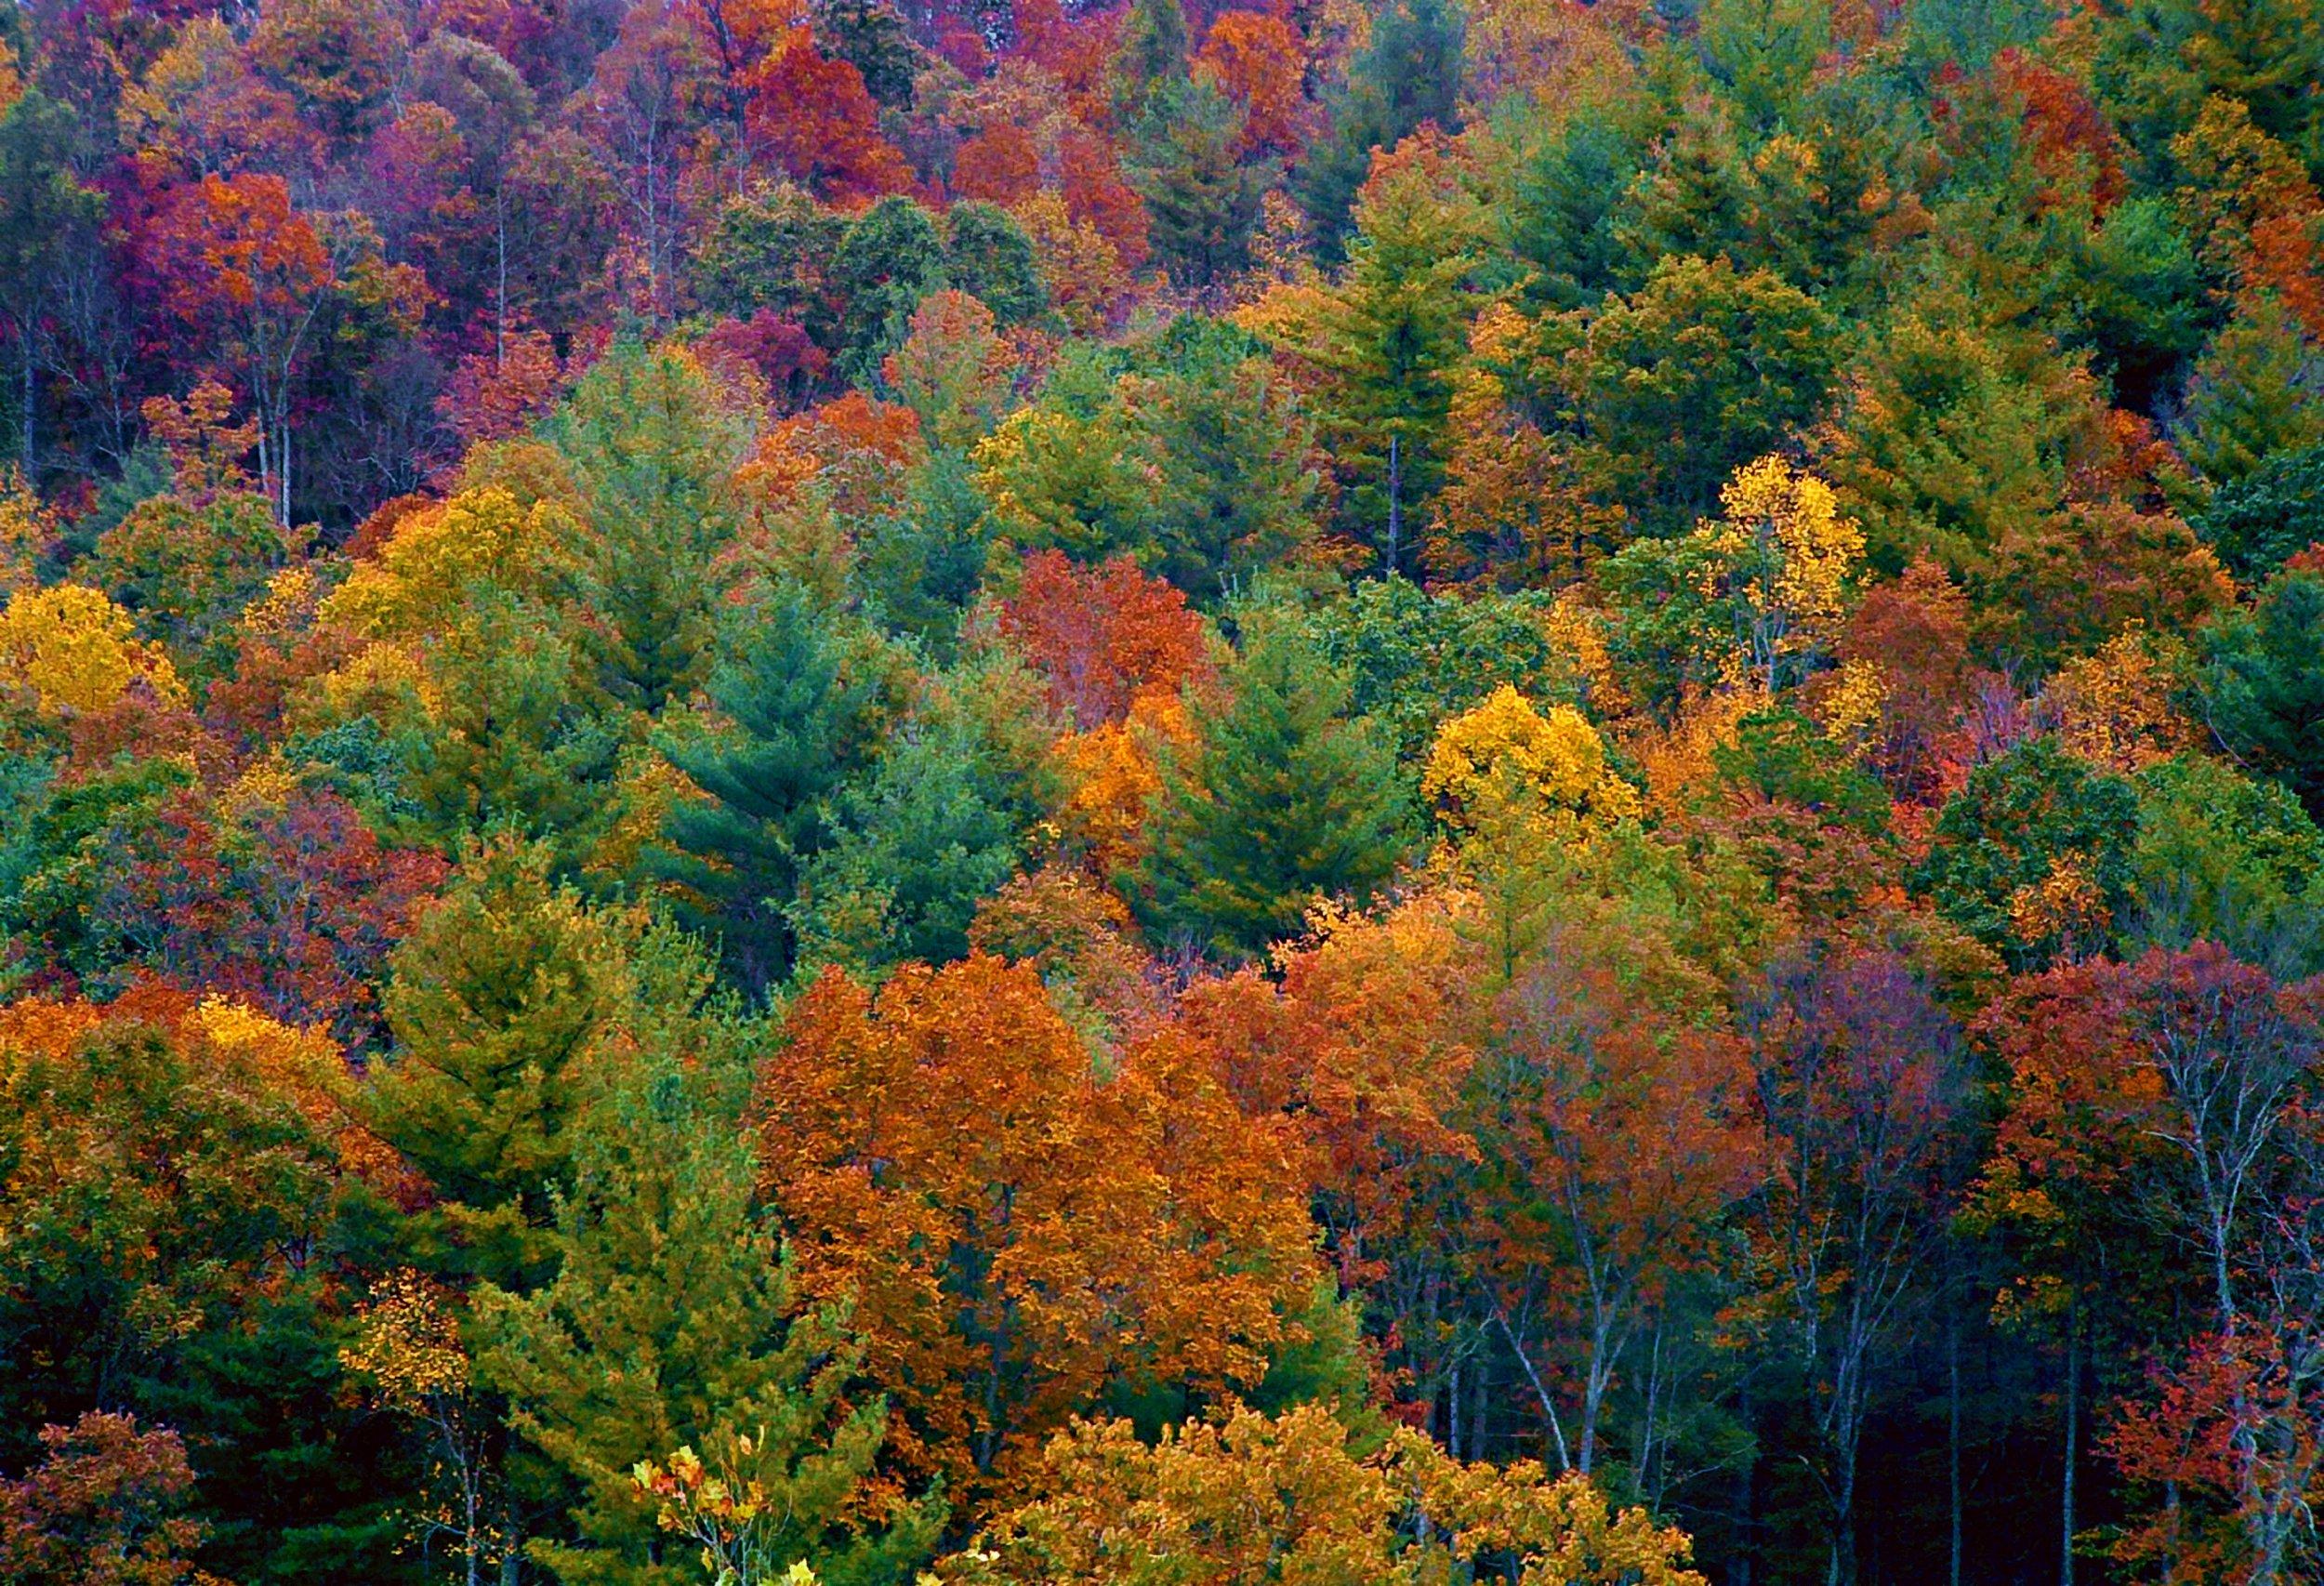 Blue Ridge Parkway Fall Wallpaper When Does Autumn Start In 2017 Autumn Equinox Will Hail